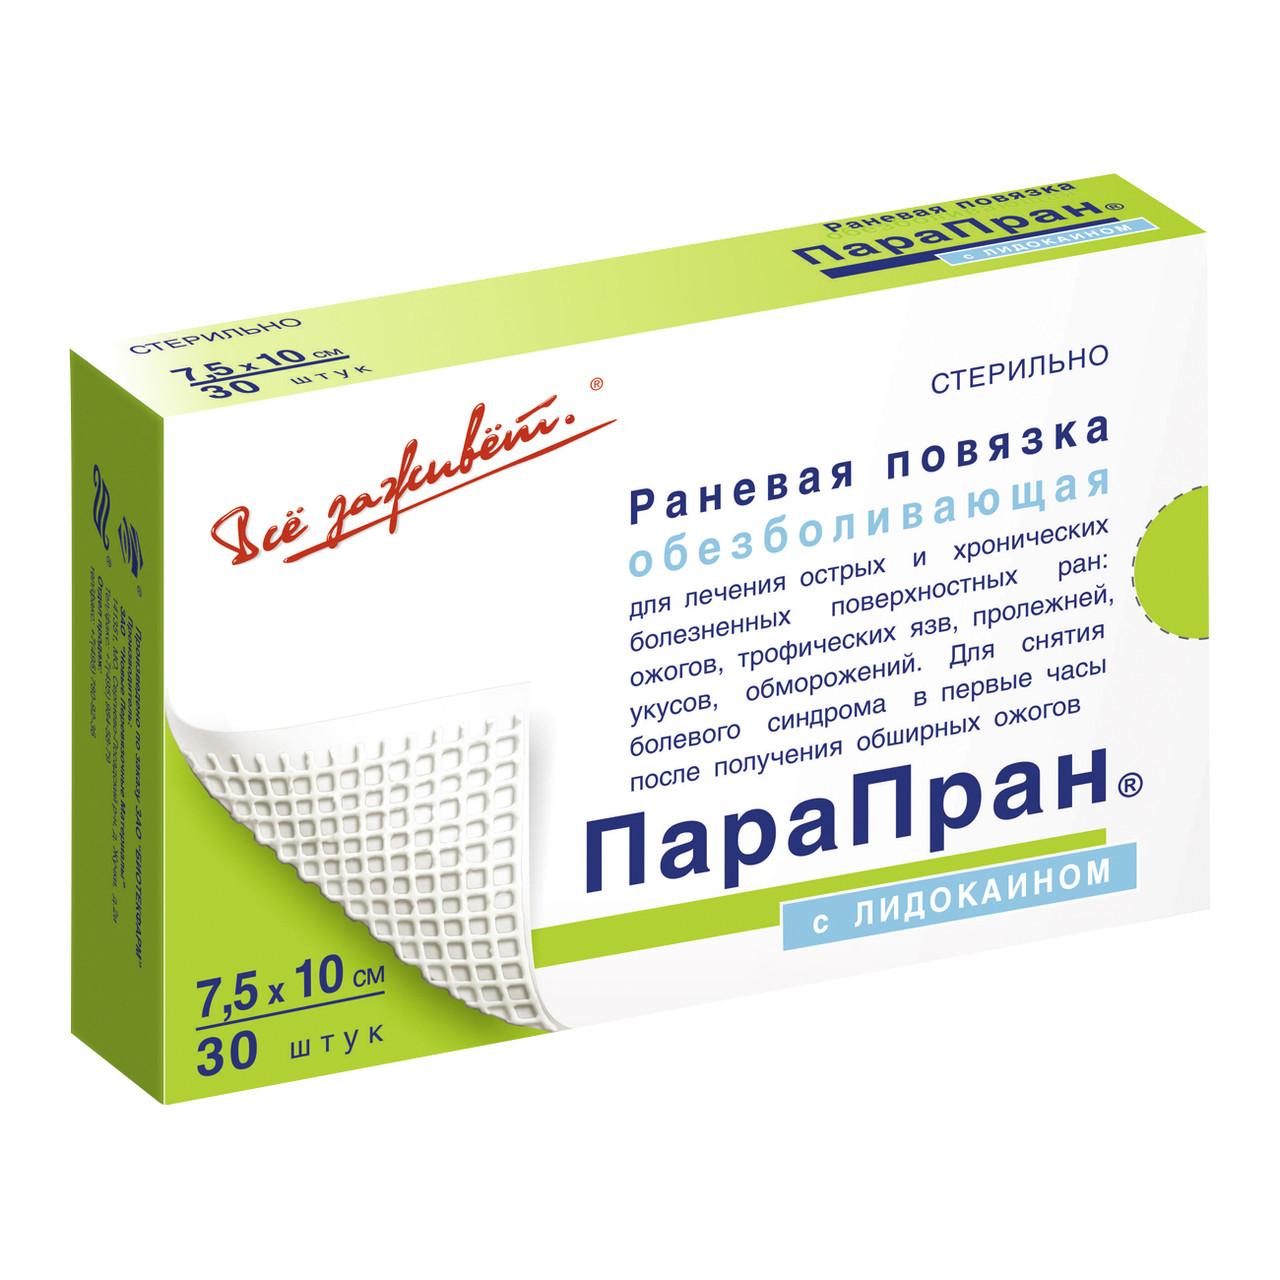 ПараПран 7,5Х10 см с лидокаином